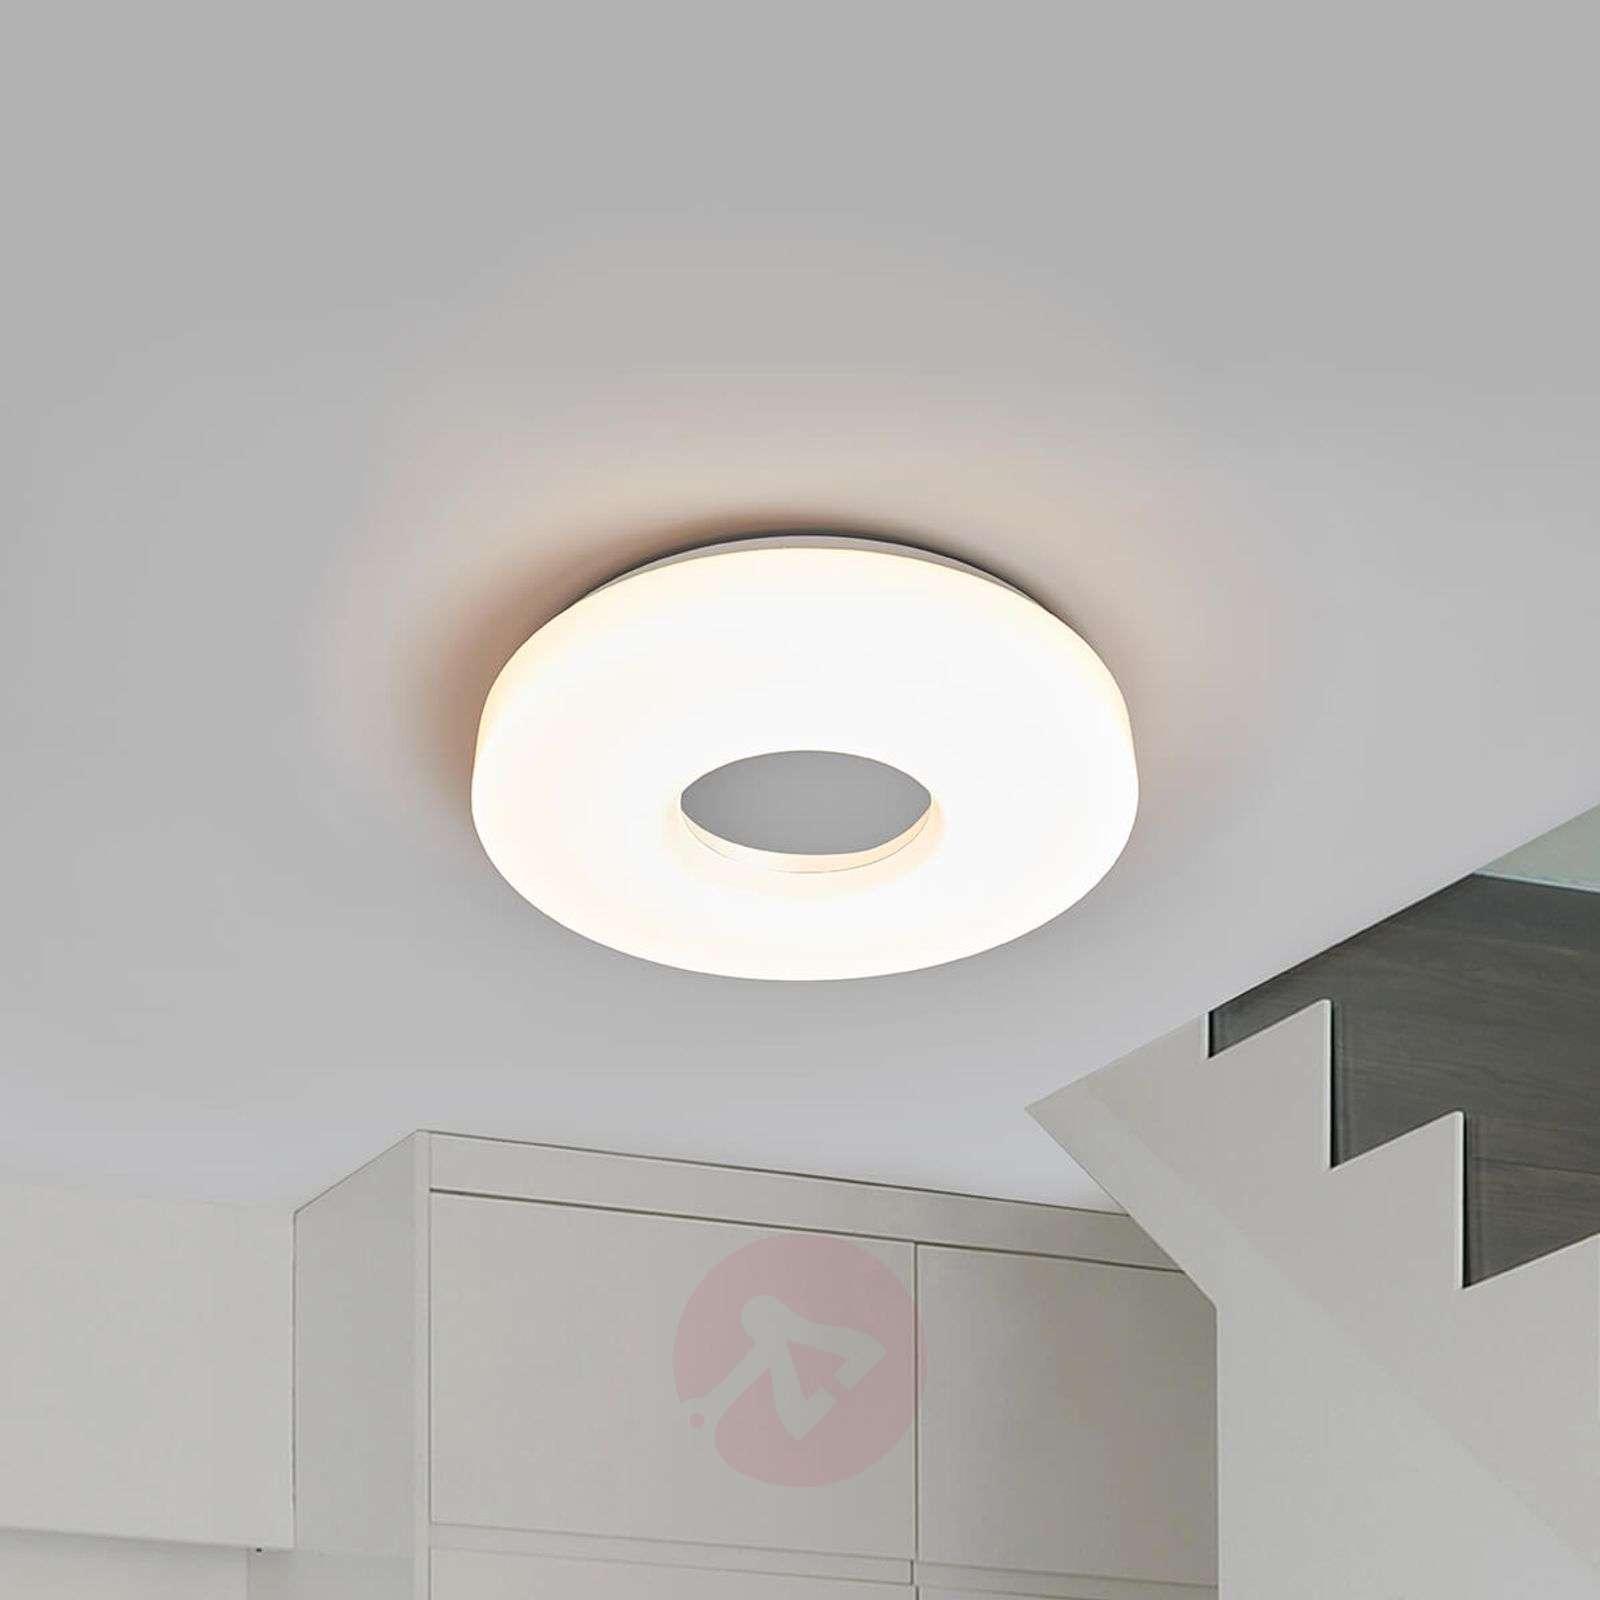 Powerful LED ceiling lamp Levina-9974022-01